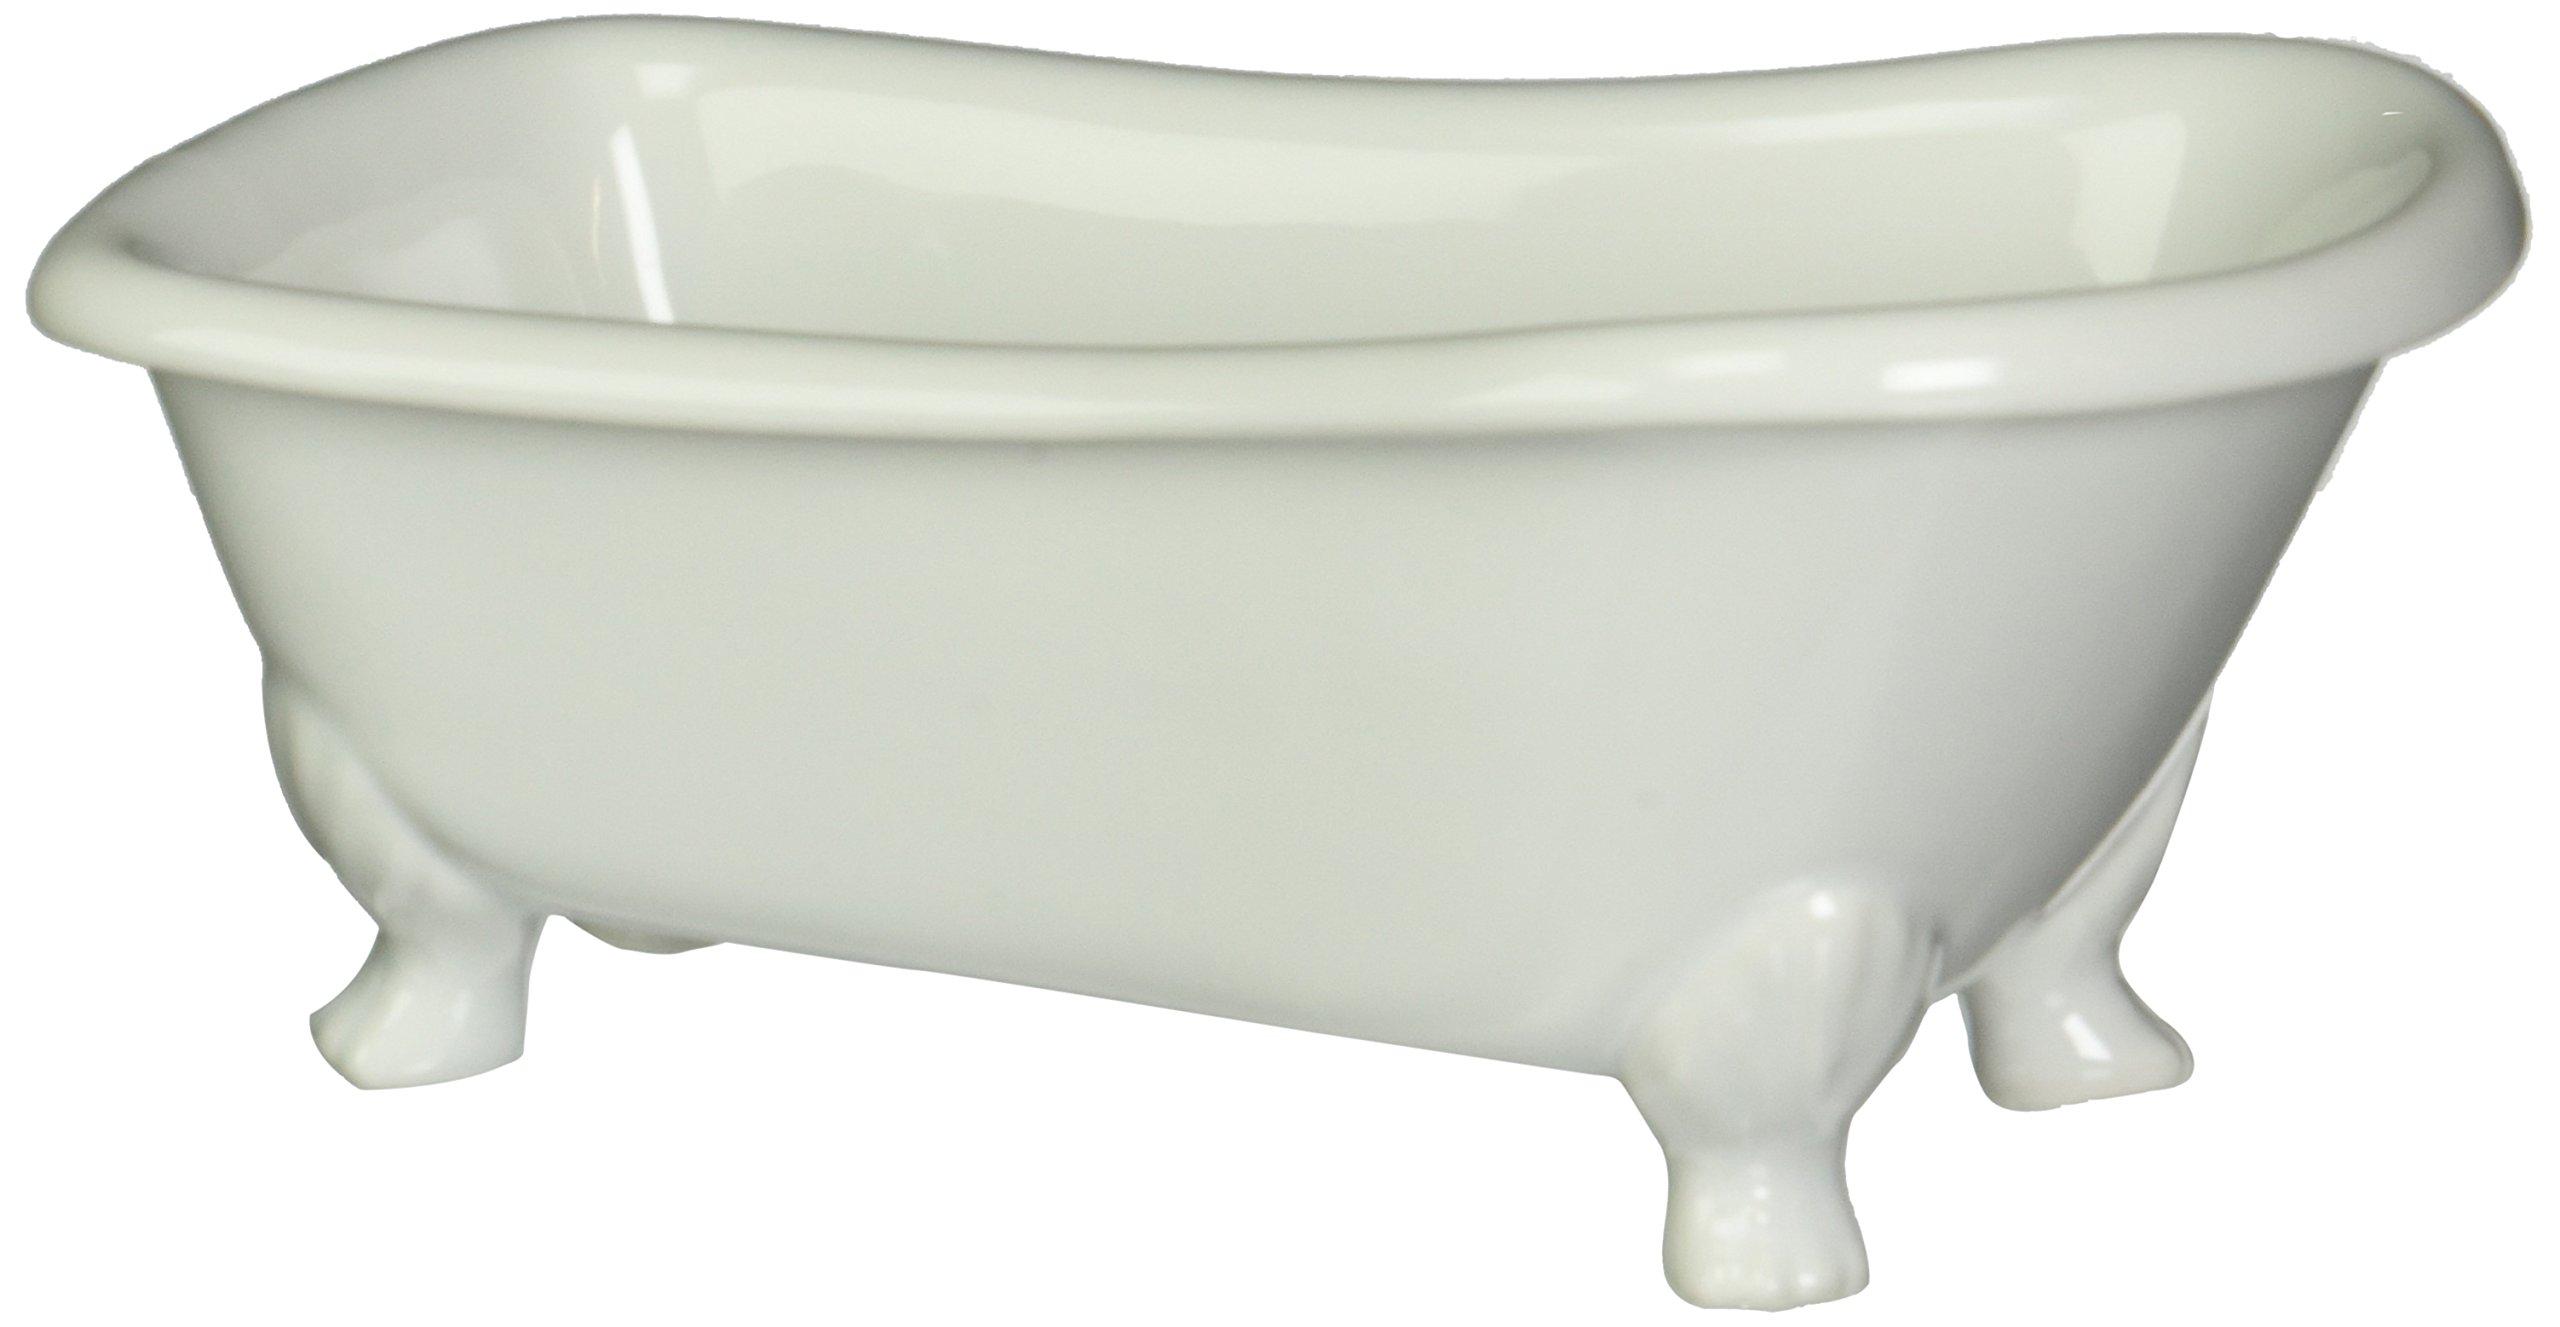 Kingston Brass BATUBW 7-Inch Length Ceramic Tub Miniature with Feet, White